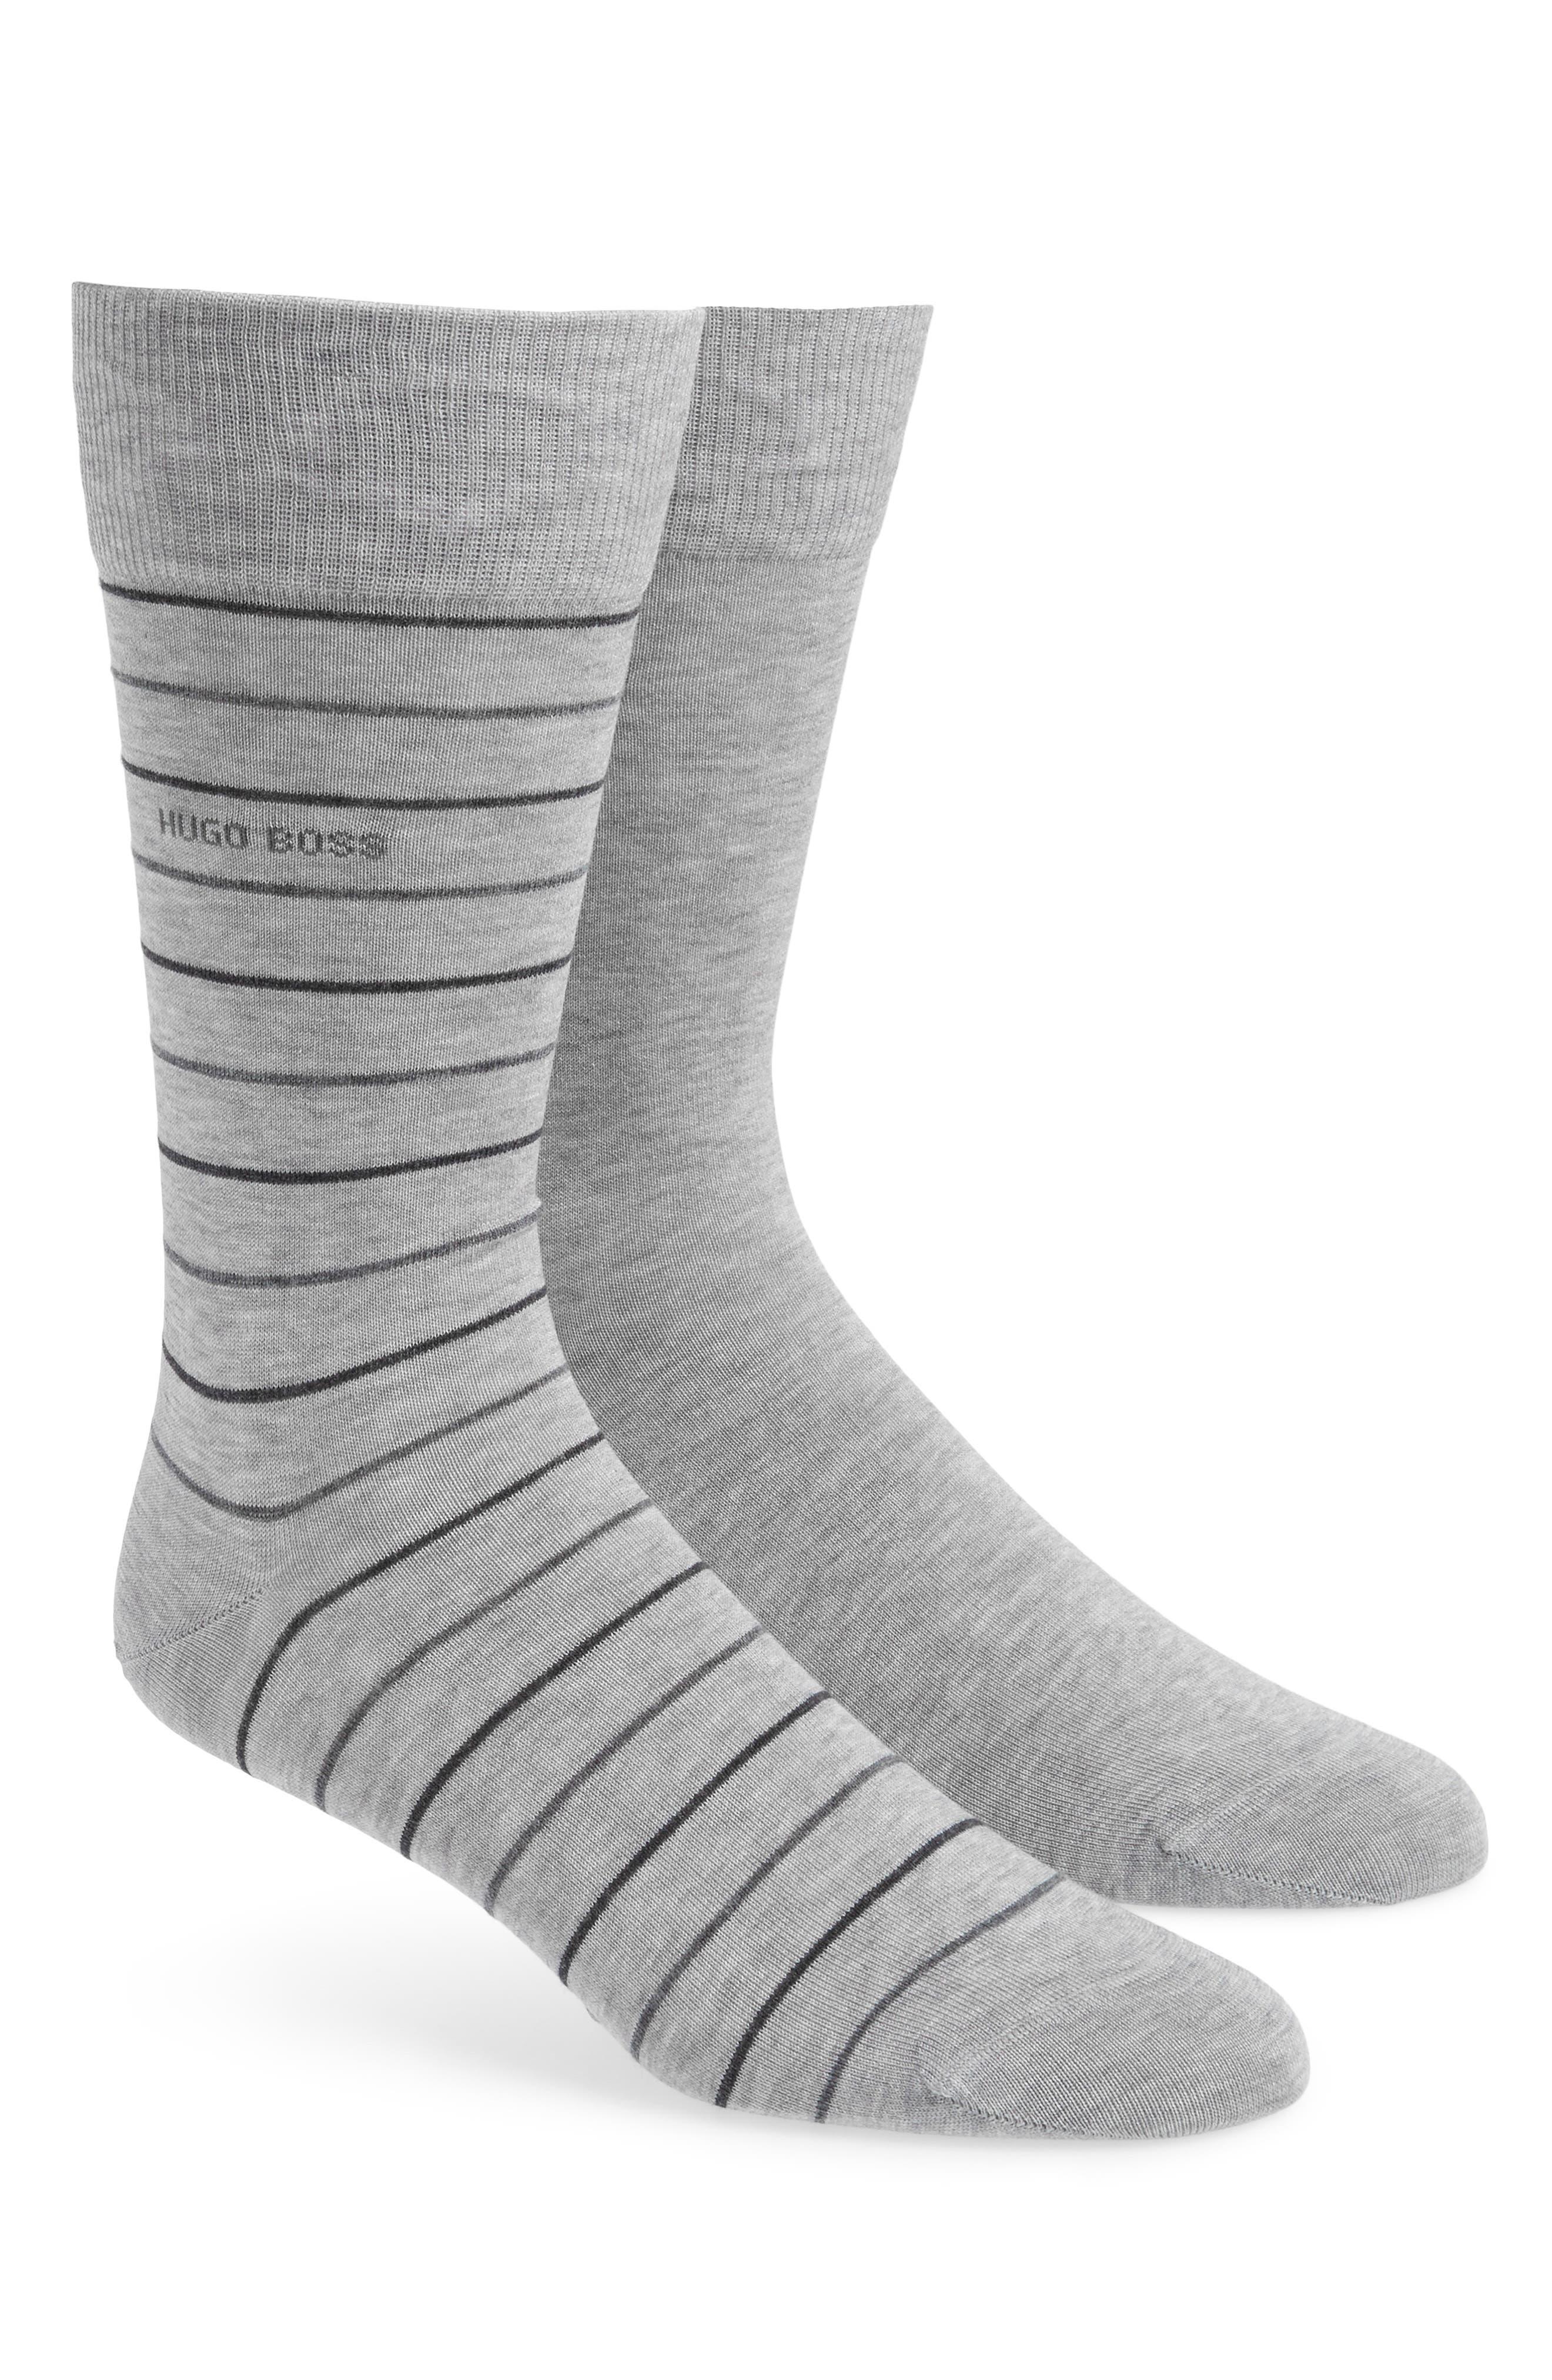 Assorted 2-Pack Socks,                         Main,                         color, GREY